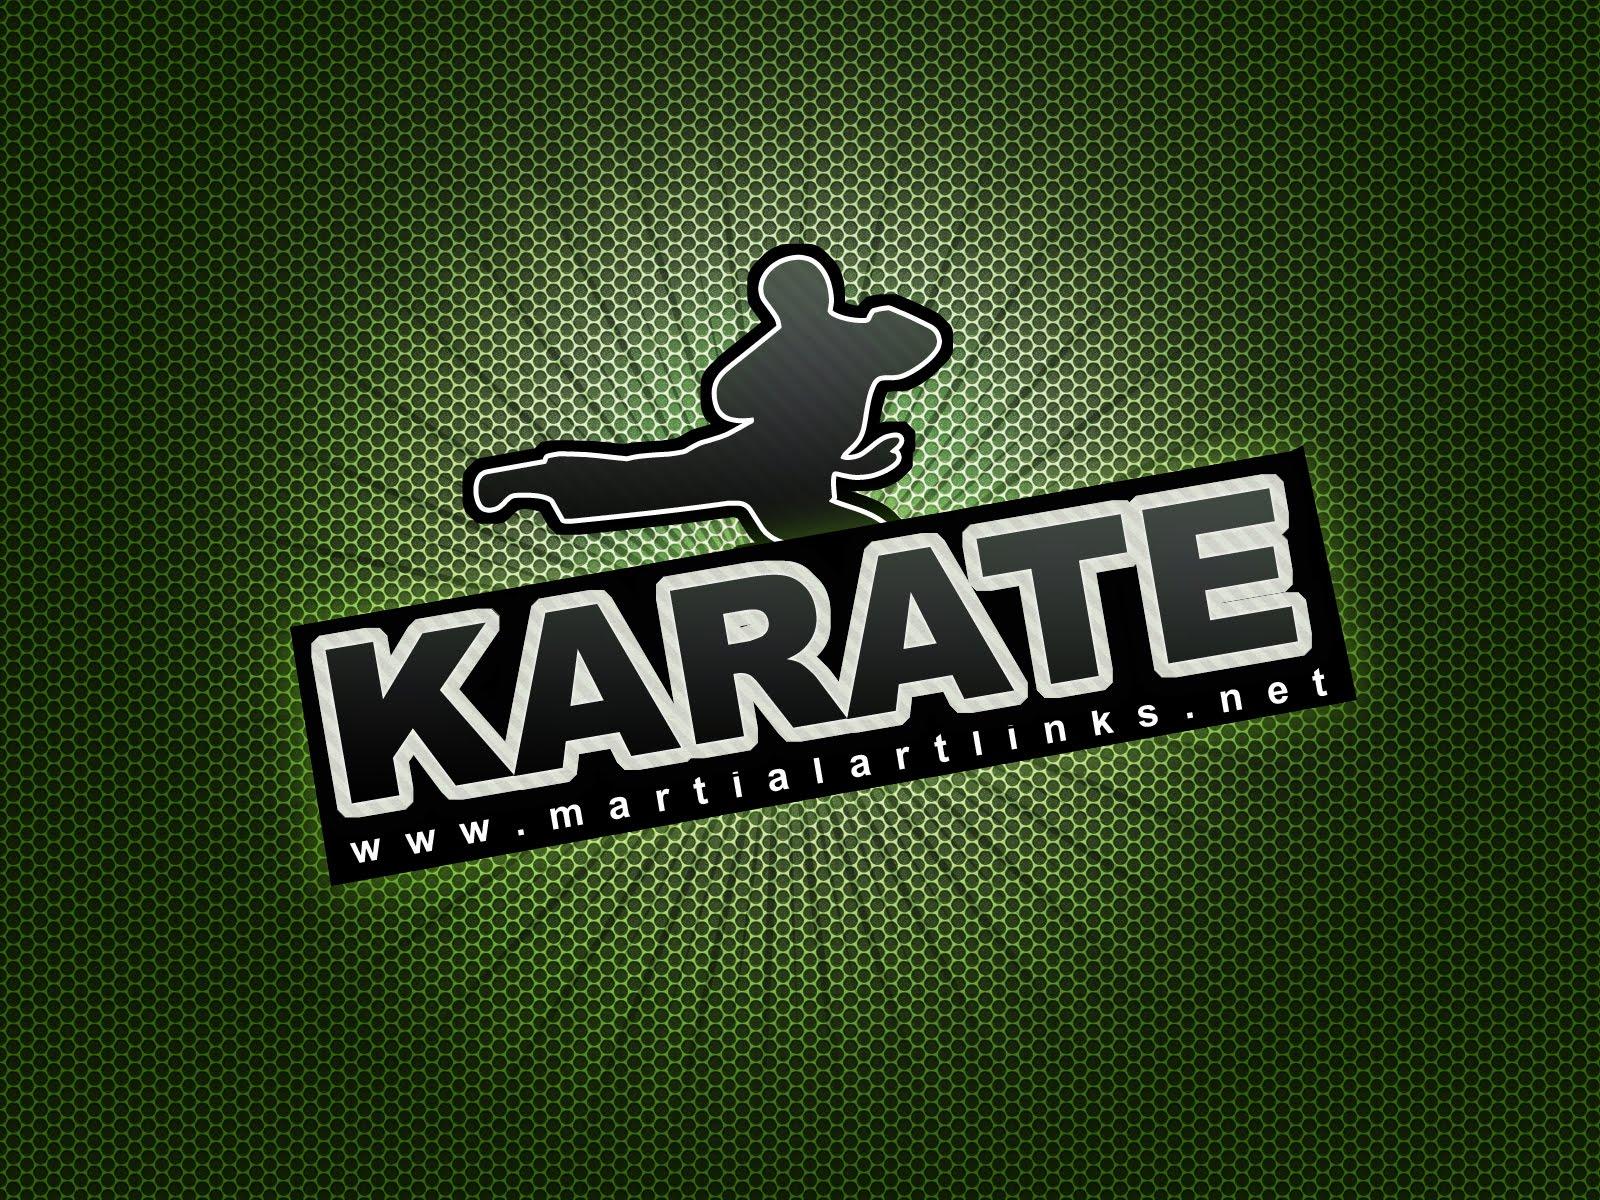 Karate kid hd wallpaper